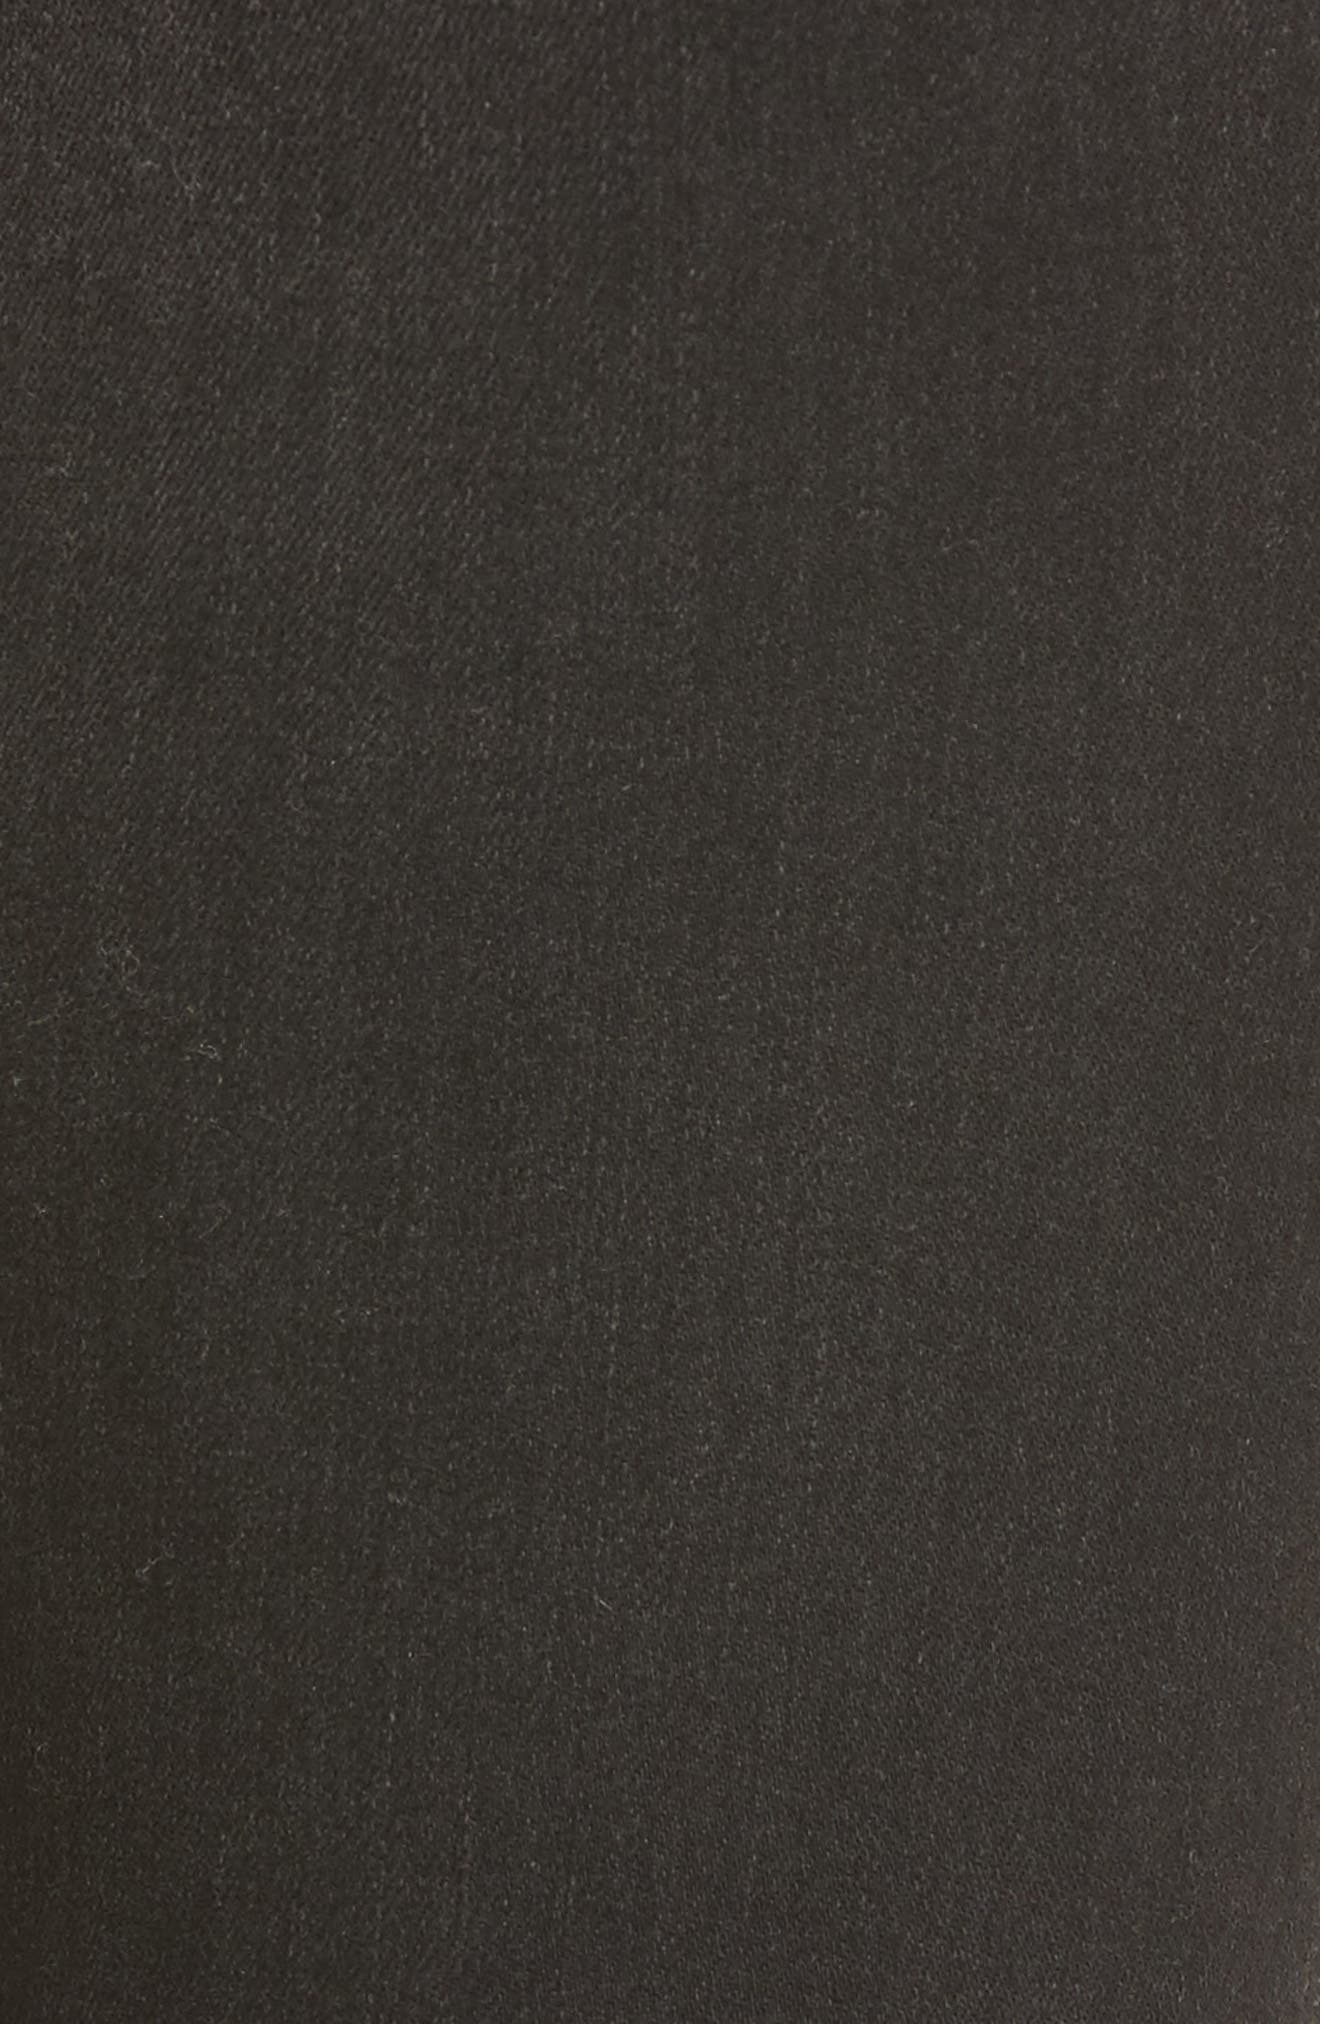 Rocket High Waist Crop Skinny Jeans,                             Alternate thumbnail 5, color,                             009